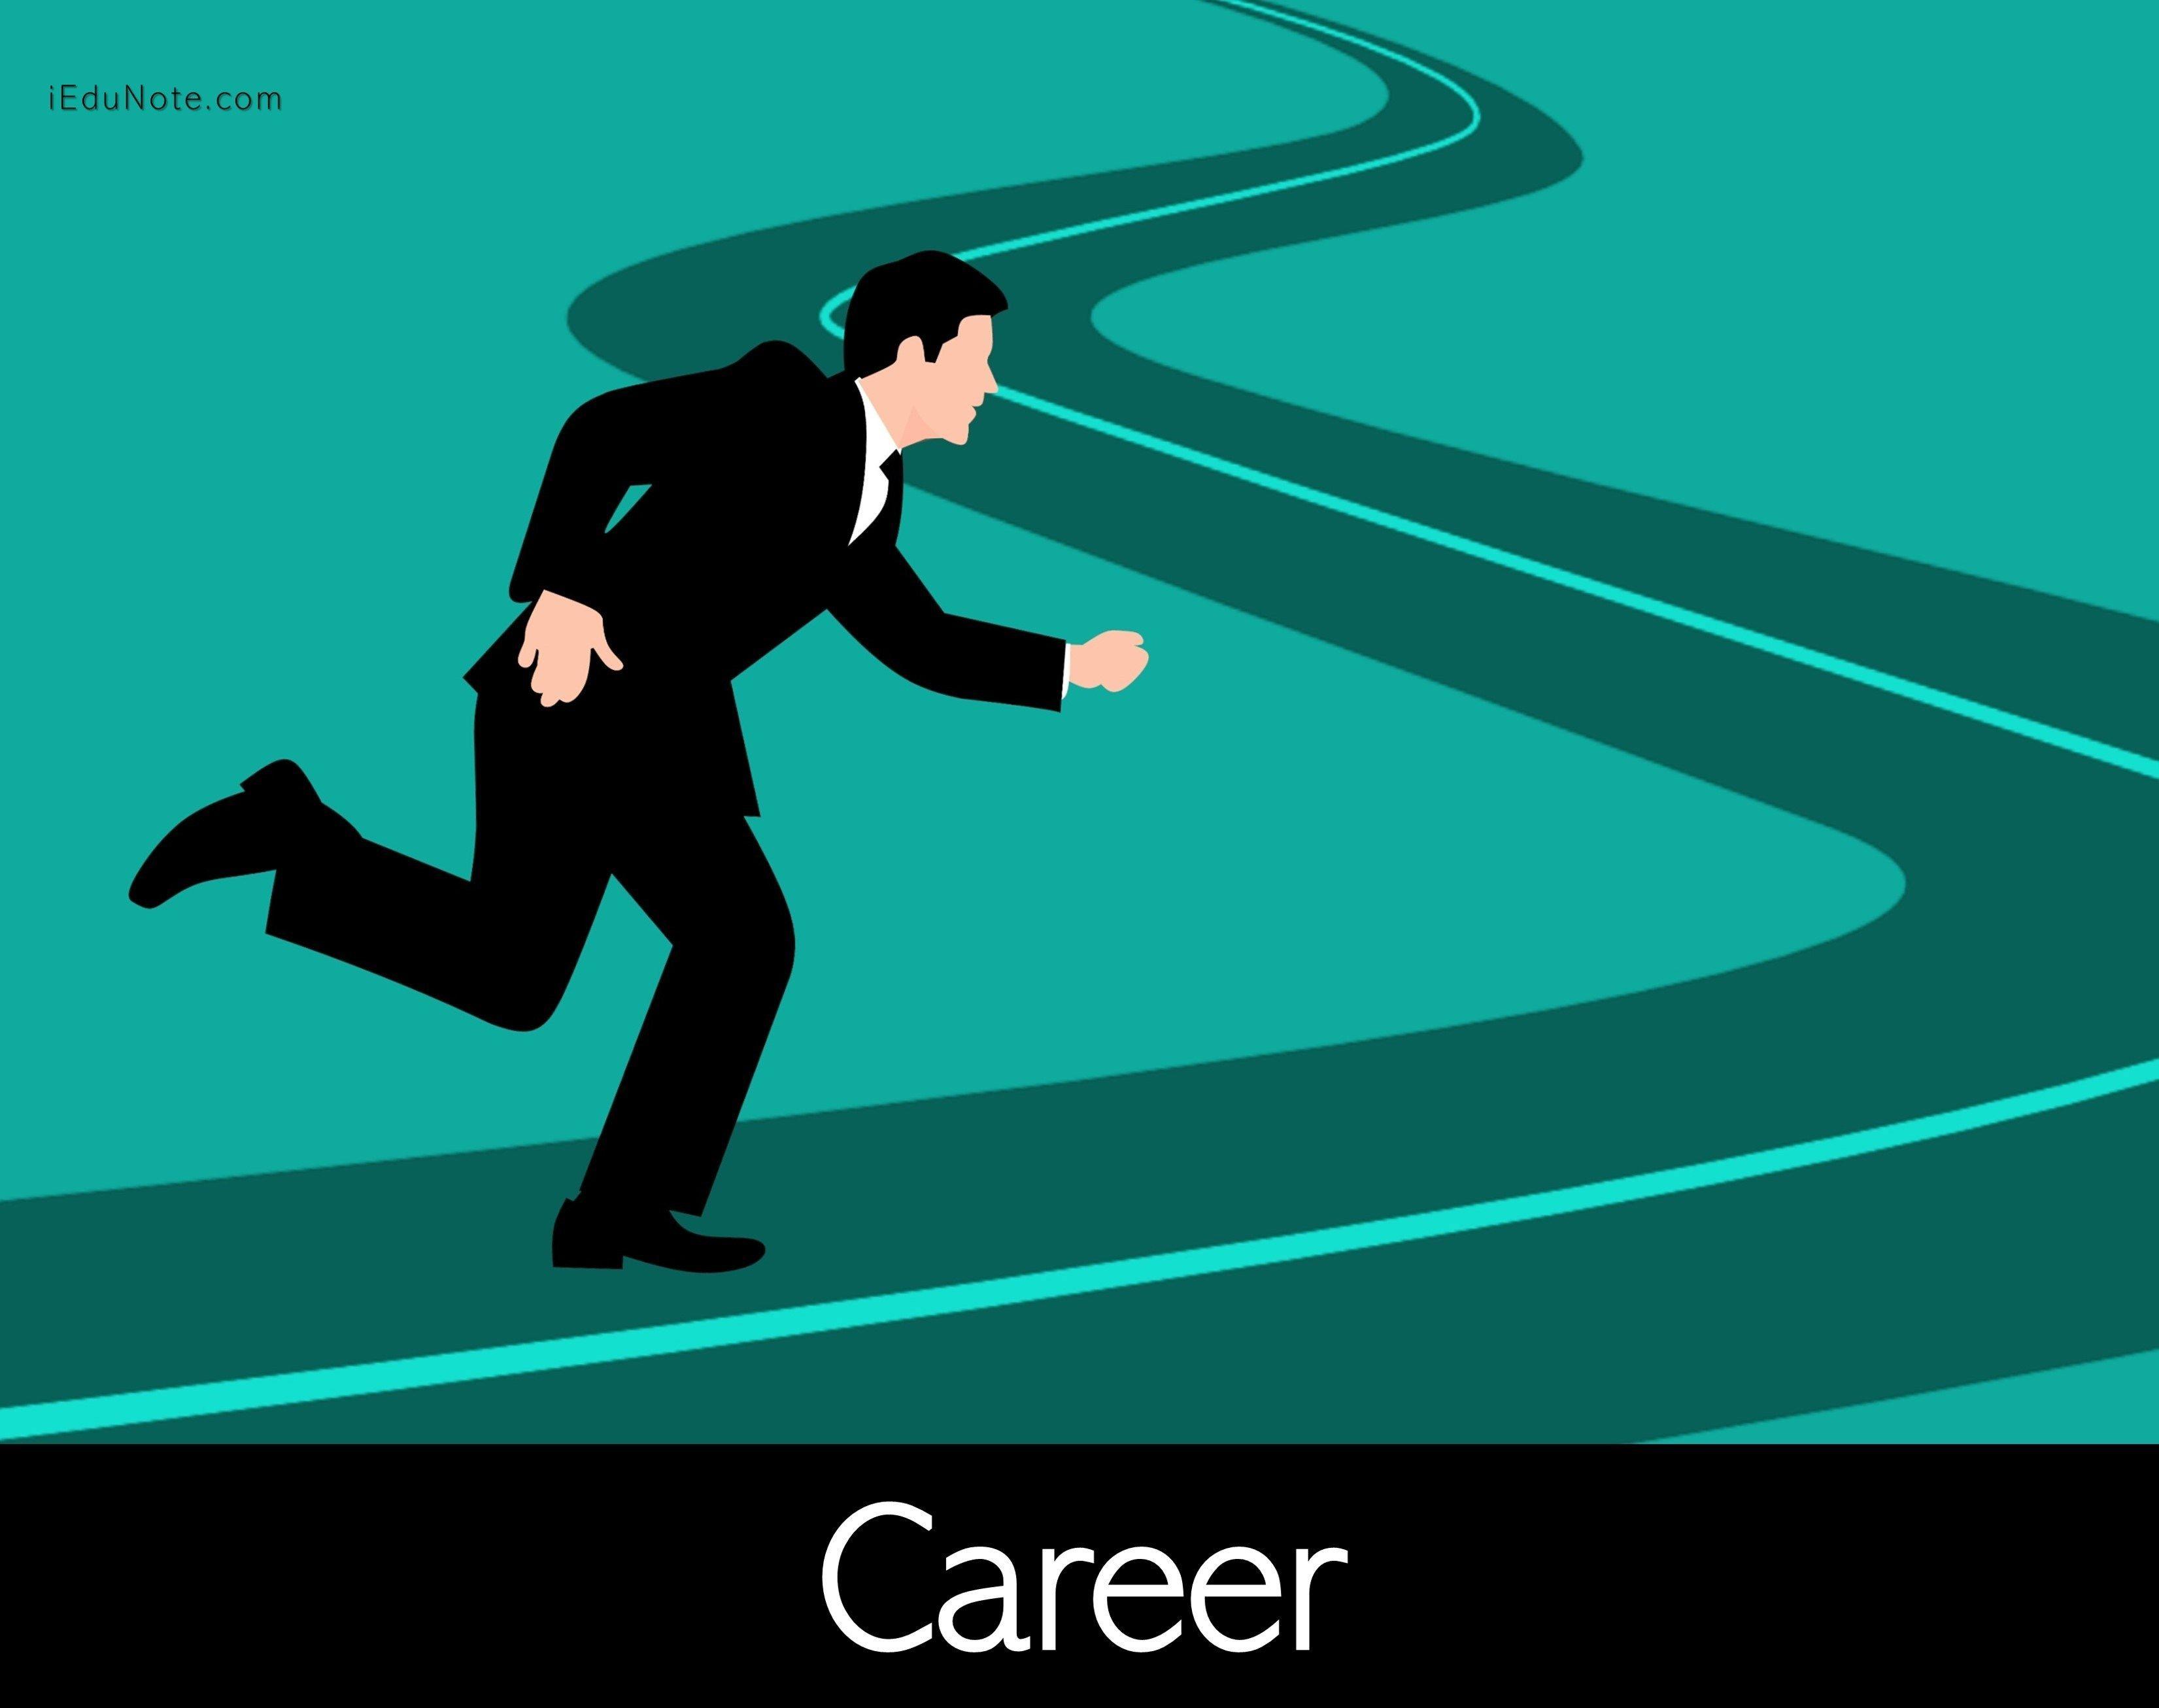 Career Definition, Career Patterns, Career vs Job